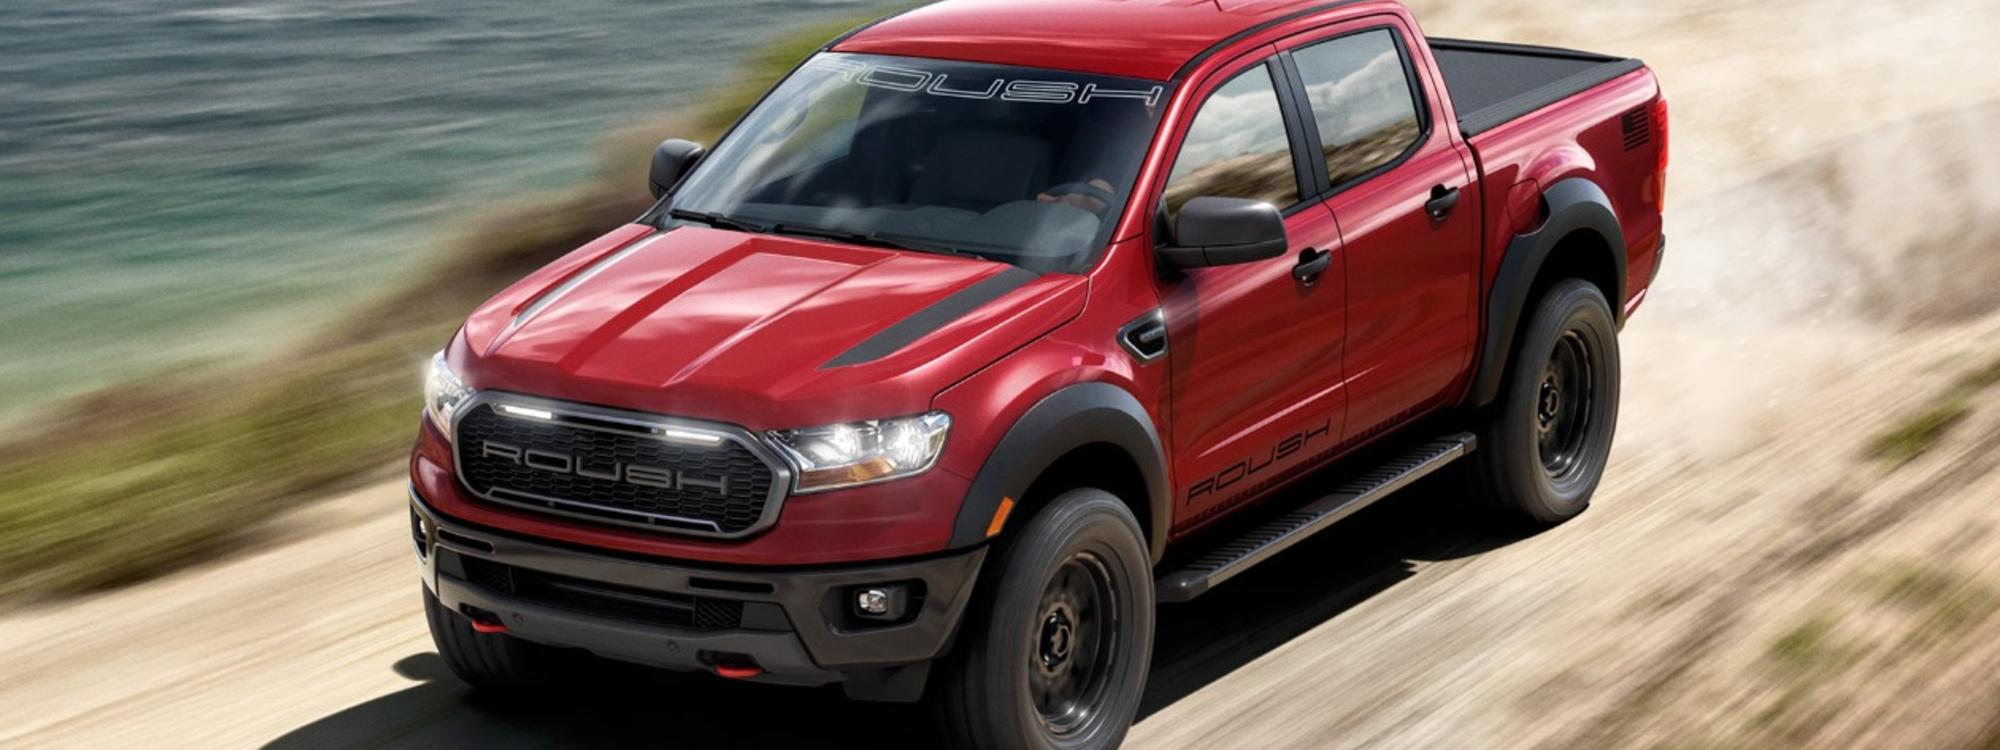 Ford Ranger Roush: Así es la Raptor norteamericana